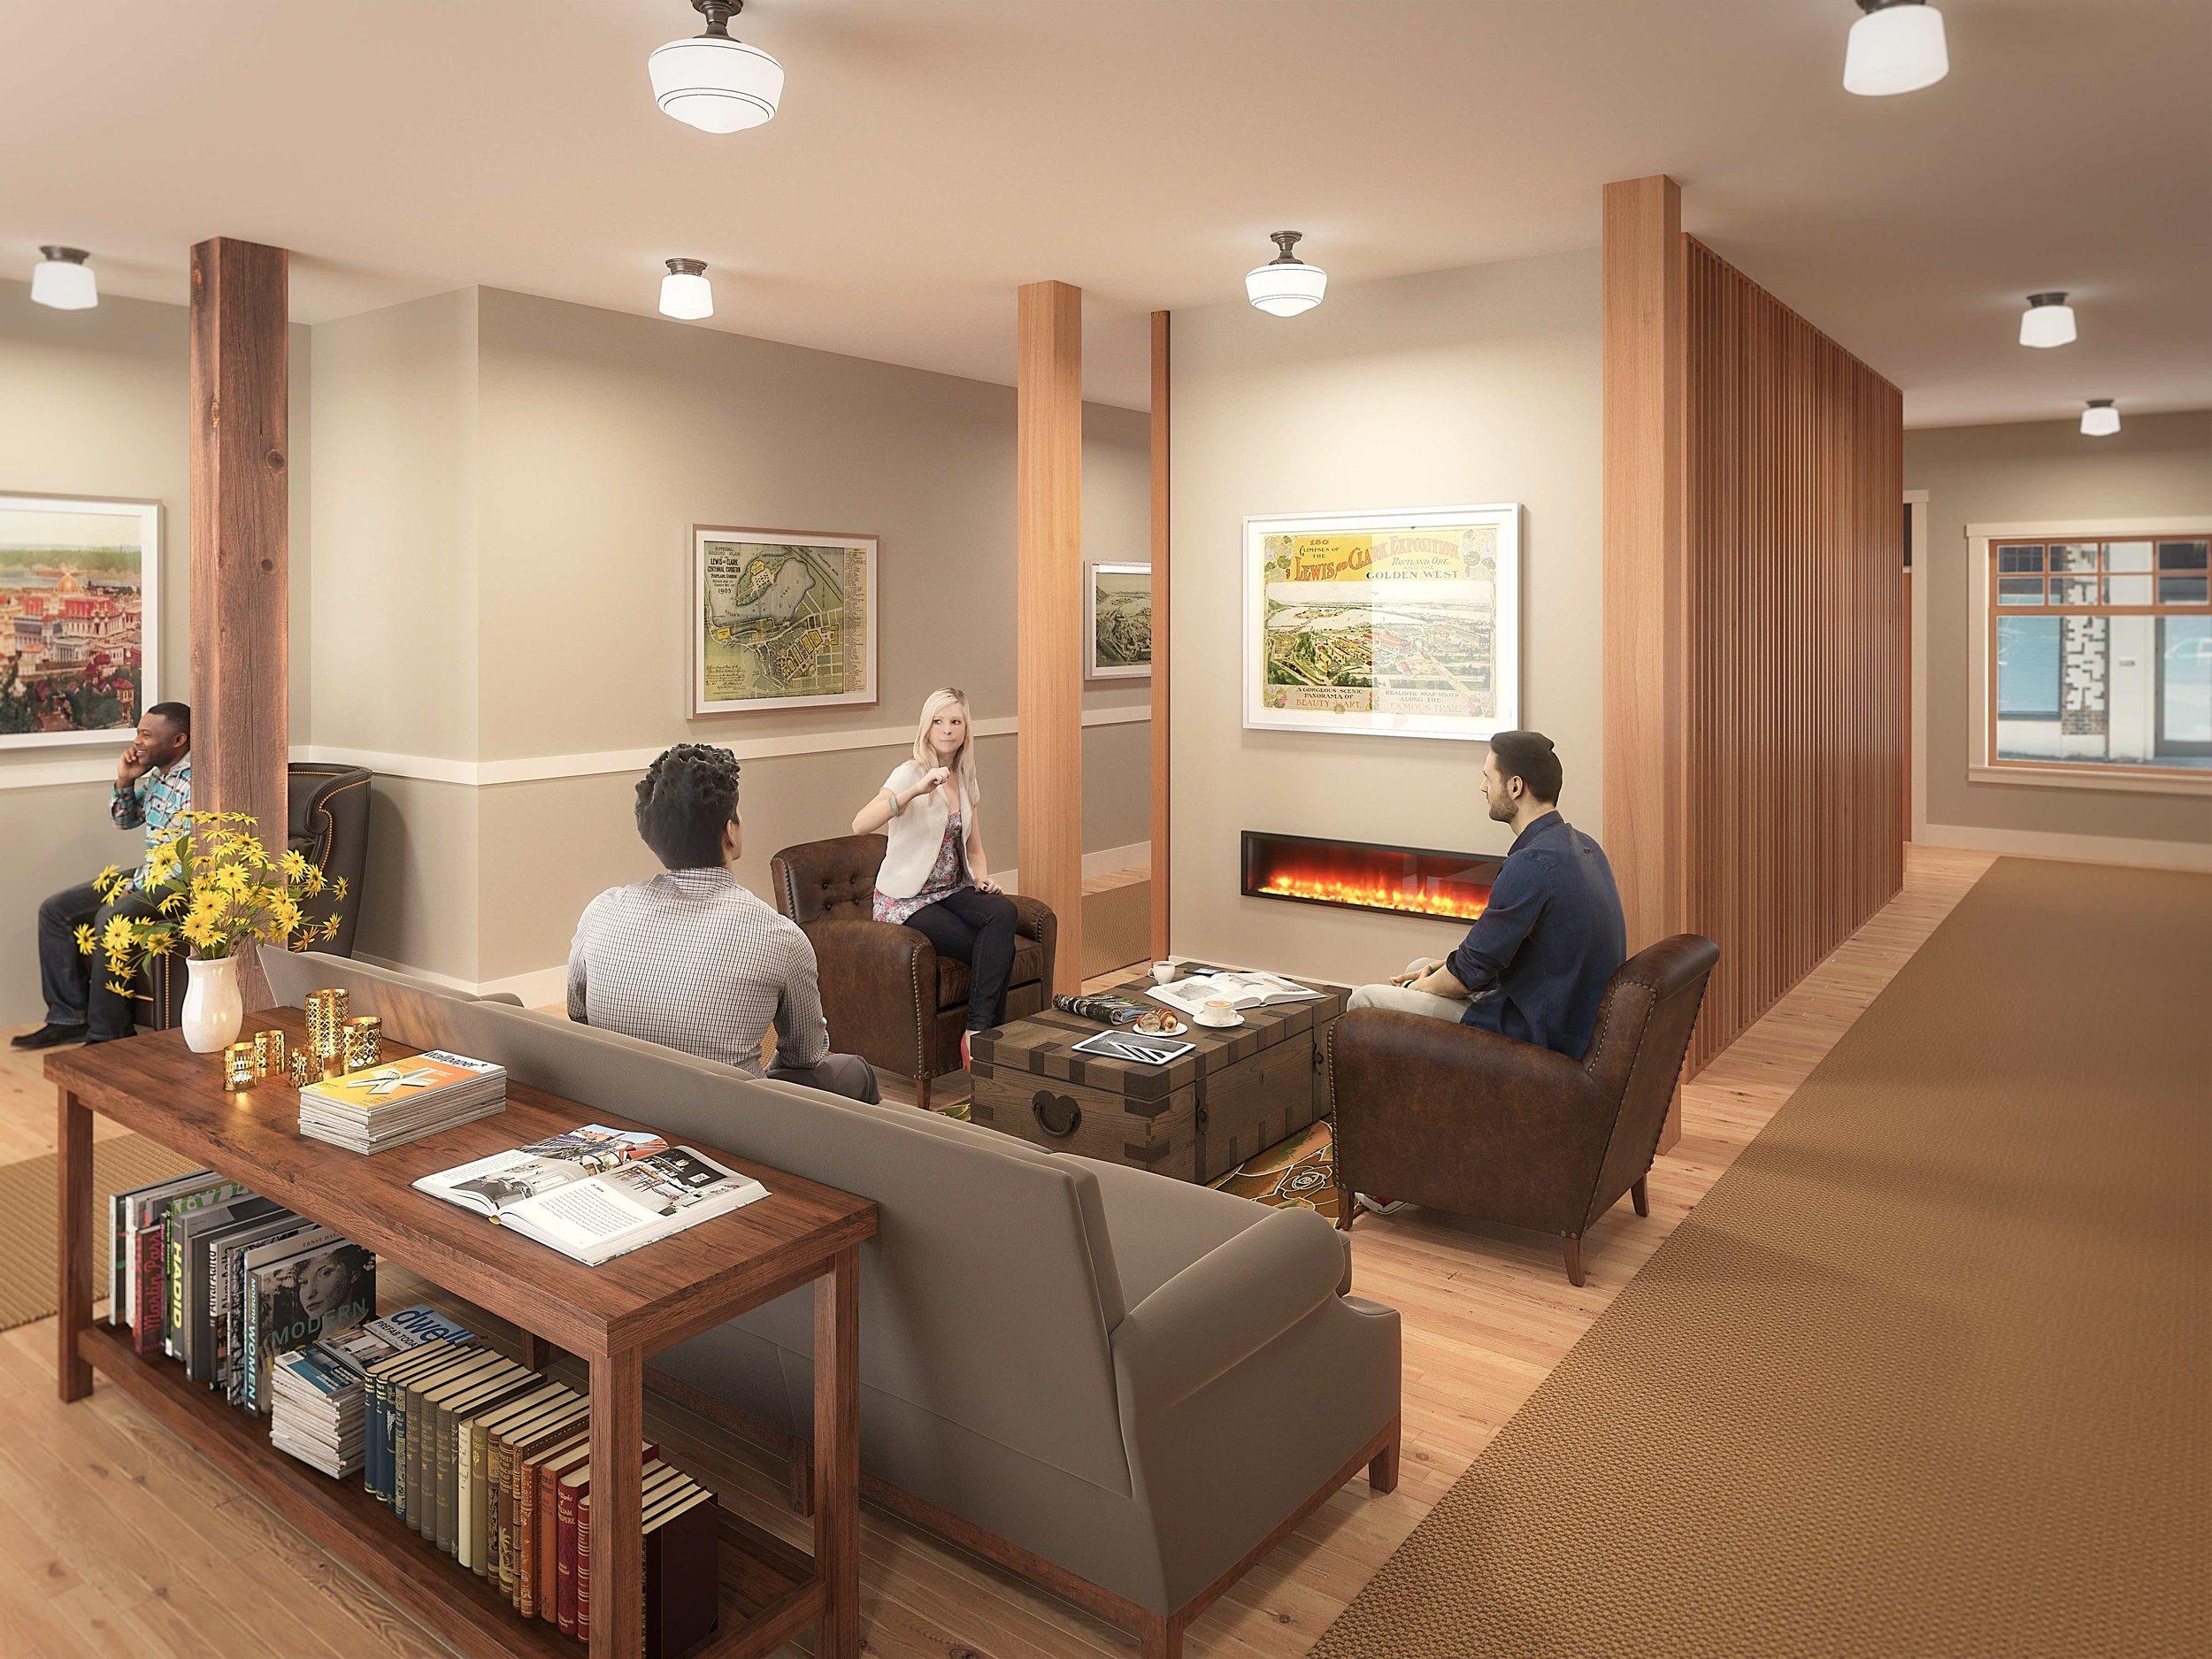 17014_Fairmont Apartments_Lobby_v004 copy.jpg